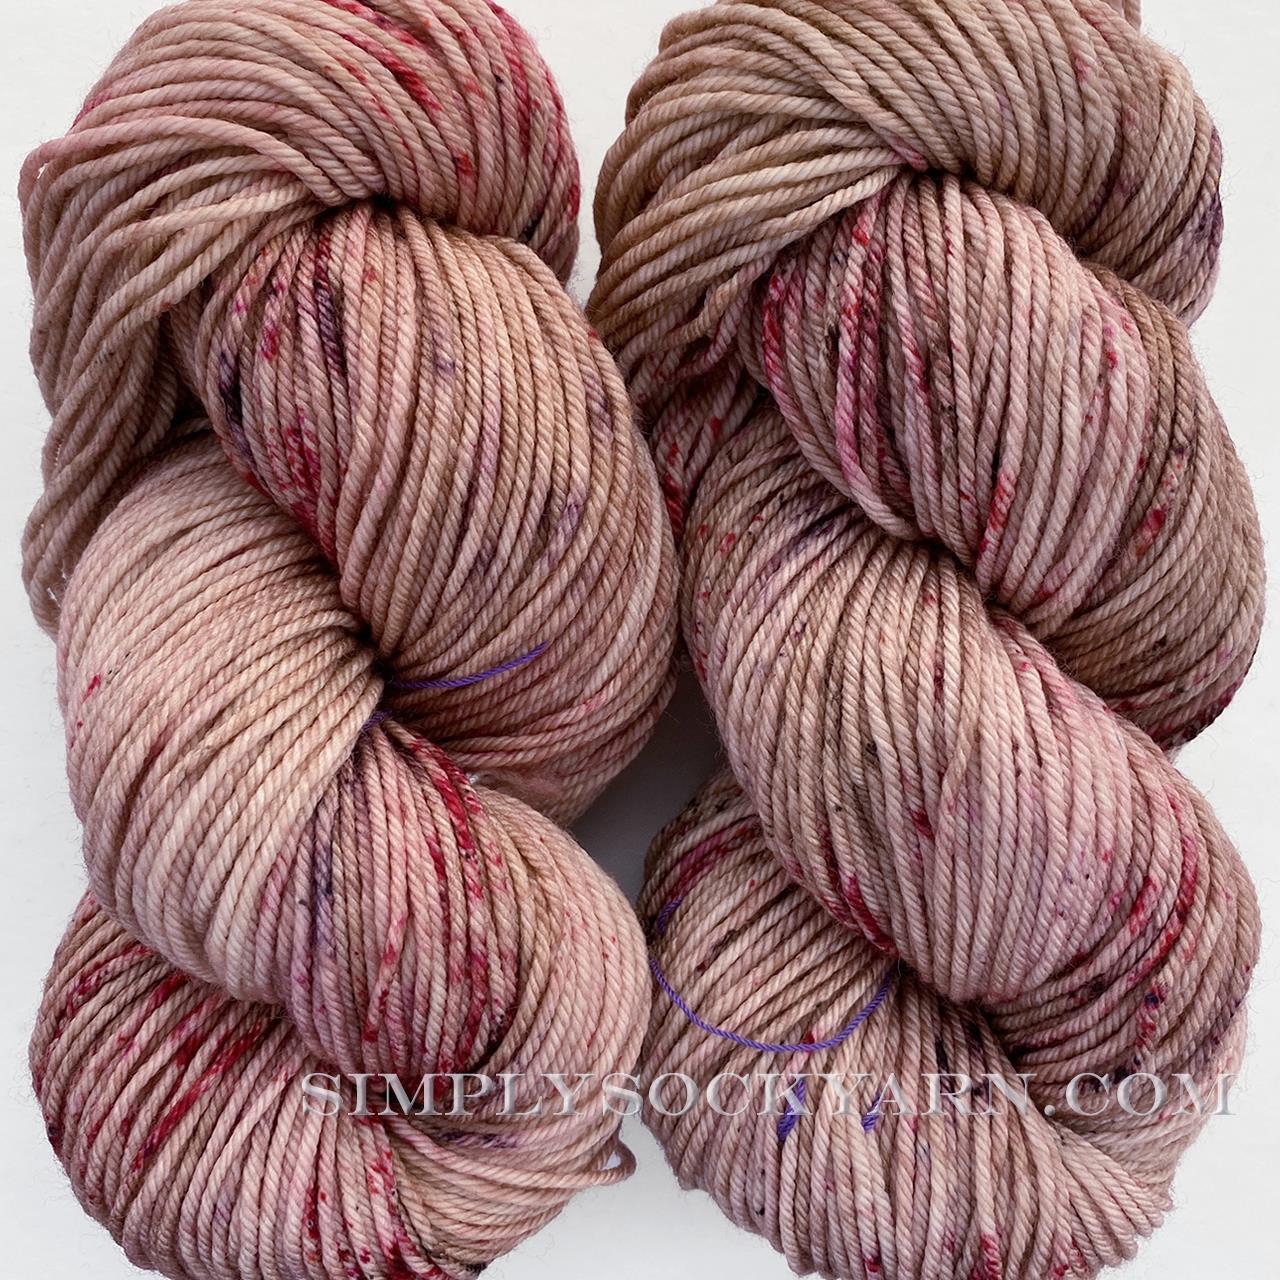 MT Tosh DK Copper Pink -